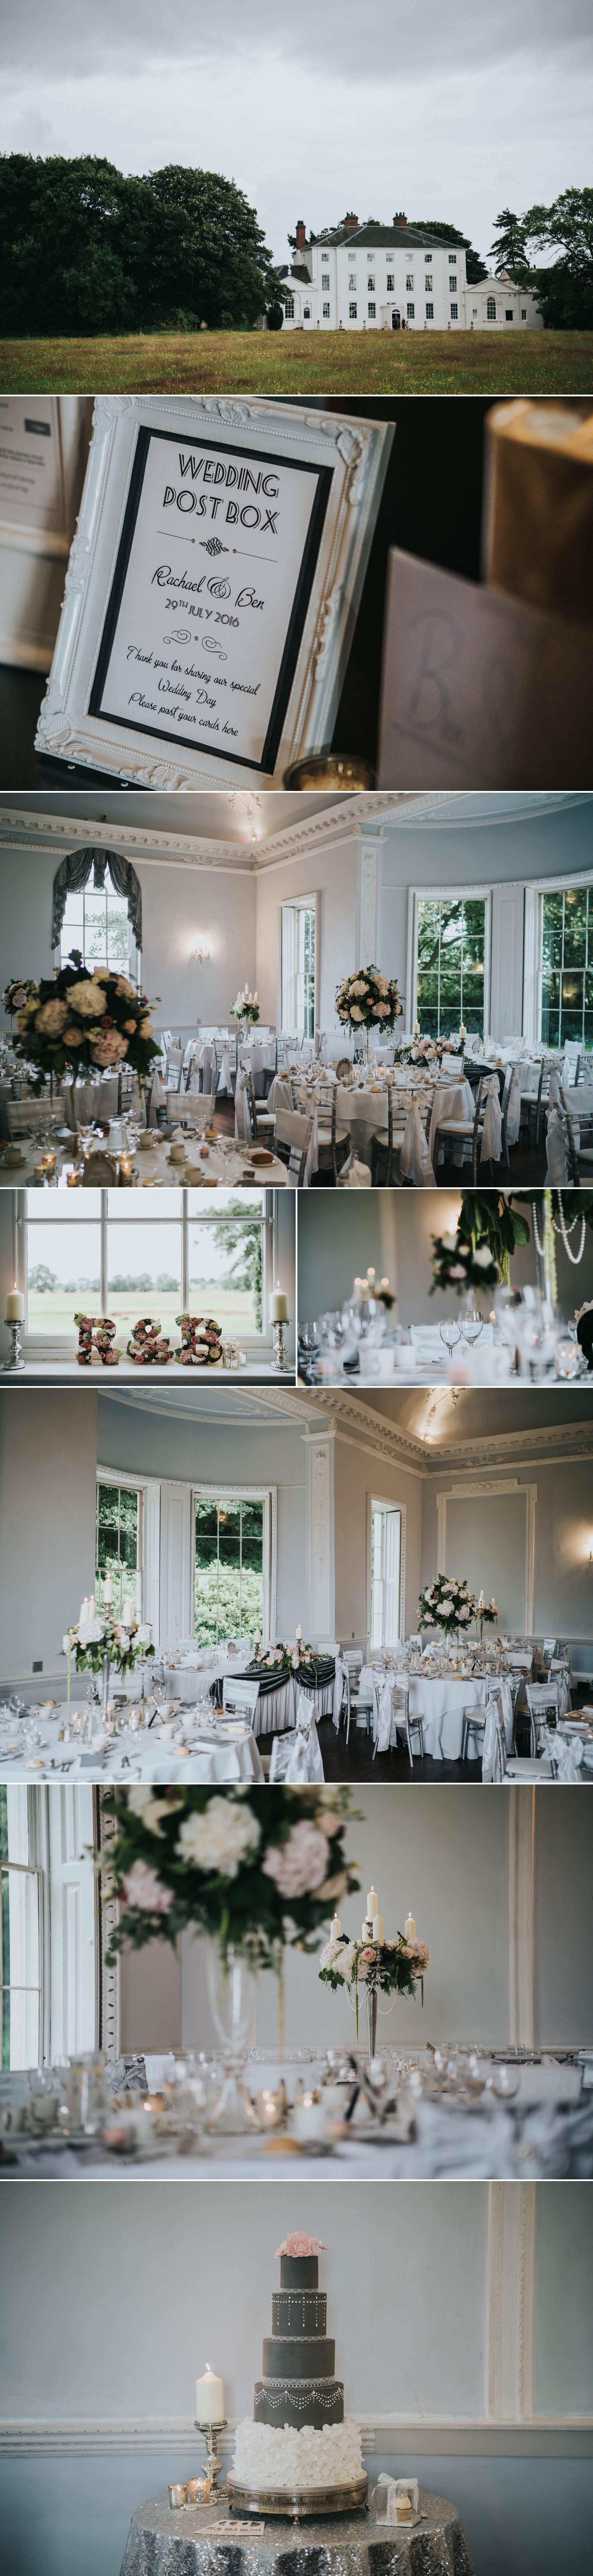 somerford-hall-wedding-photography 12.jpg